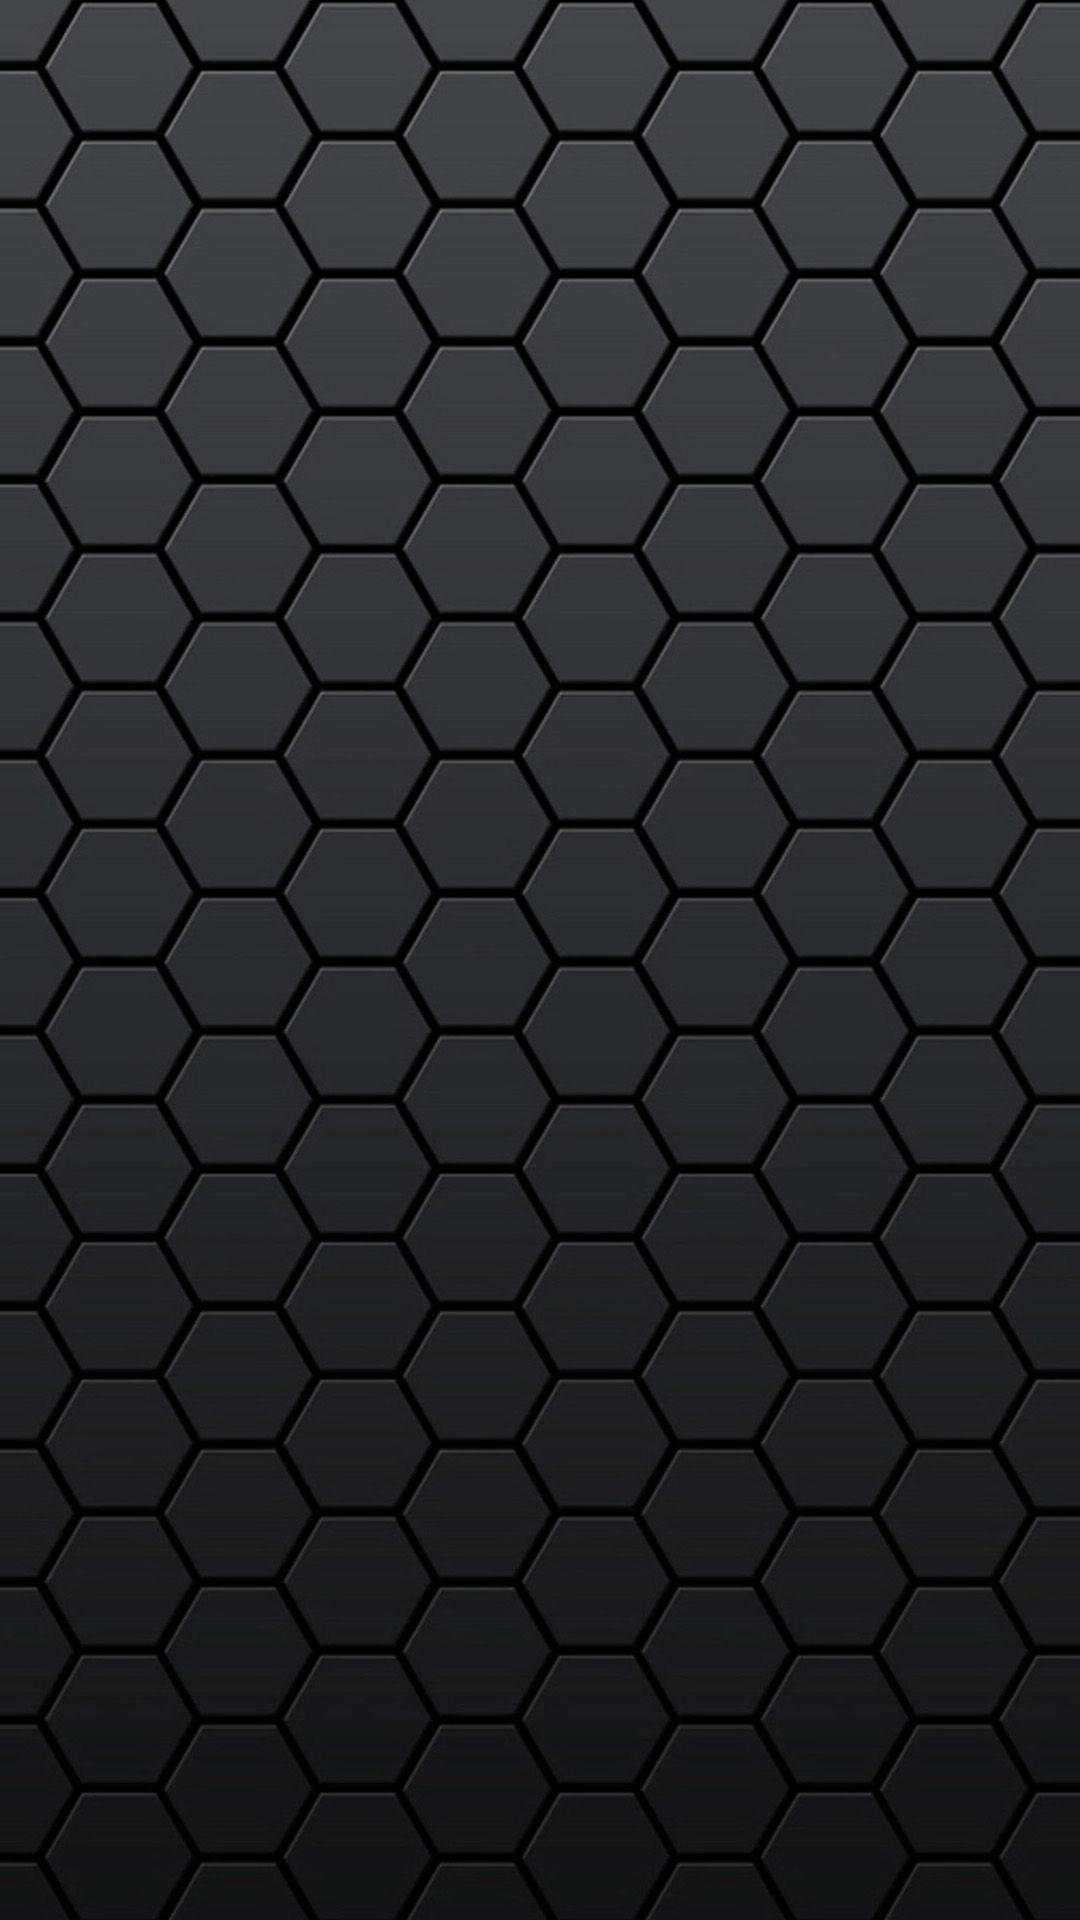 Carbon Fiber Iphone Wallpaper Widescreen In 2020 Carbon Fiber Wallpaper Black Phone Wallpaper Iphone Wallpaper